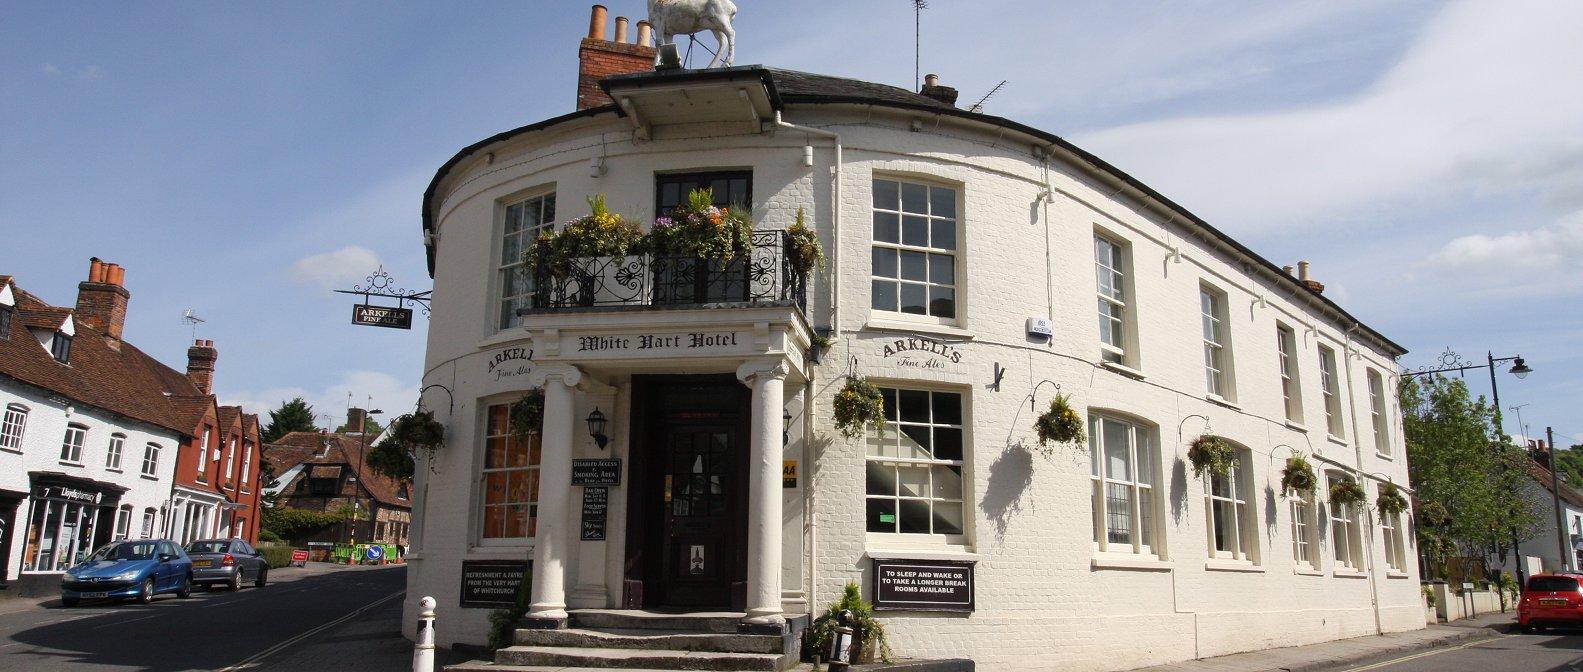 Slideshow image White Hart Hotel & Restaurant Whitchurch accommodation/bed-and-breakfast/pub food Newbury